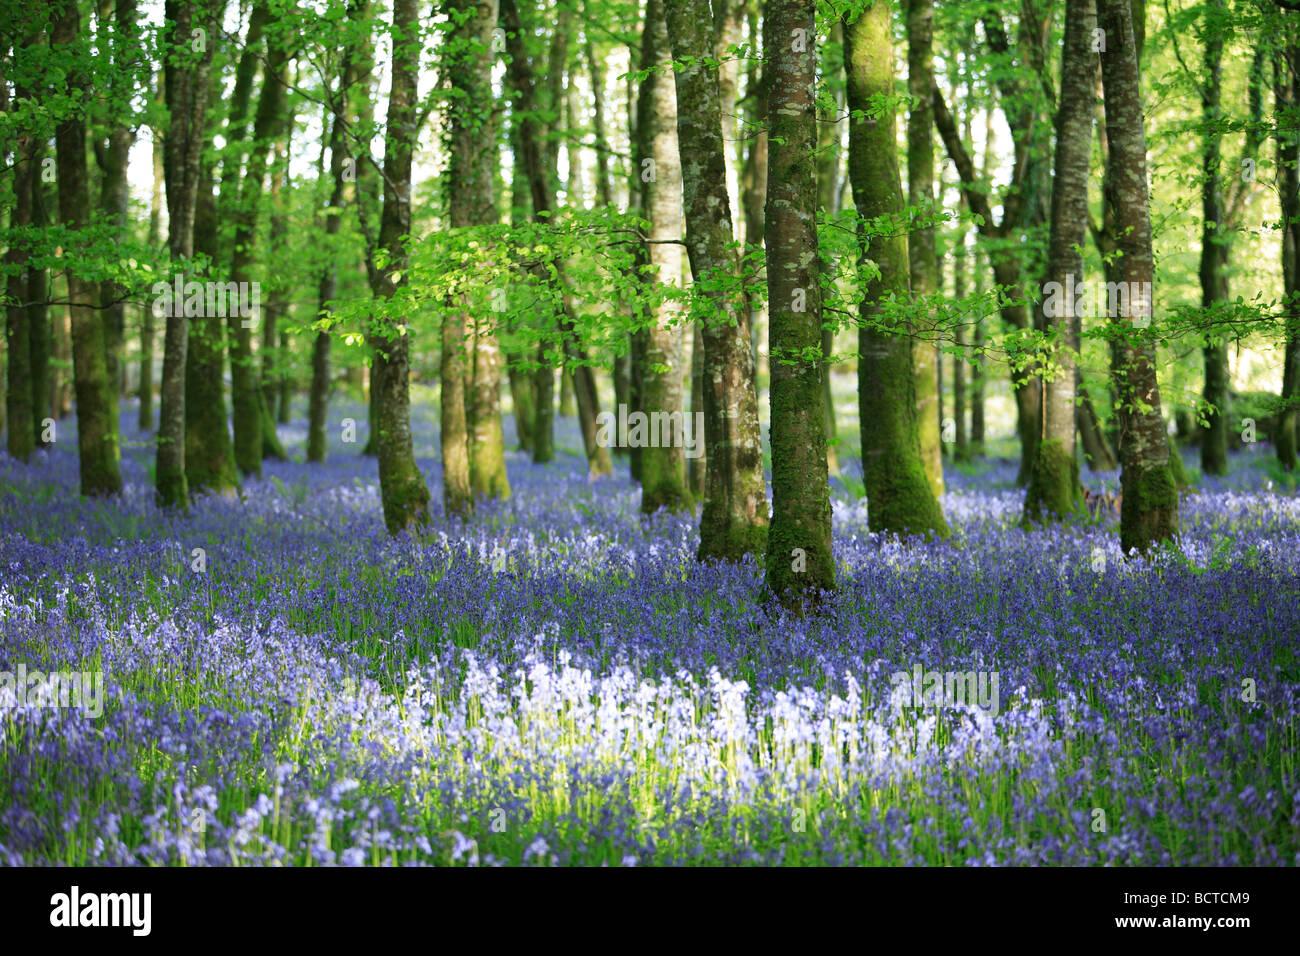 Bluebells  in  beech  woods - Stock Image